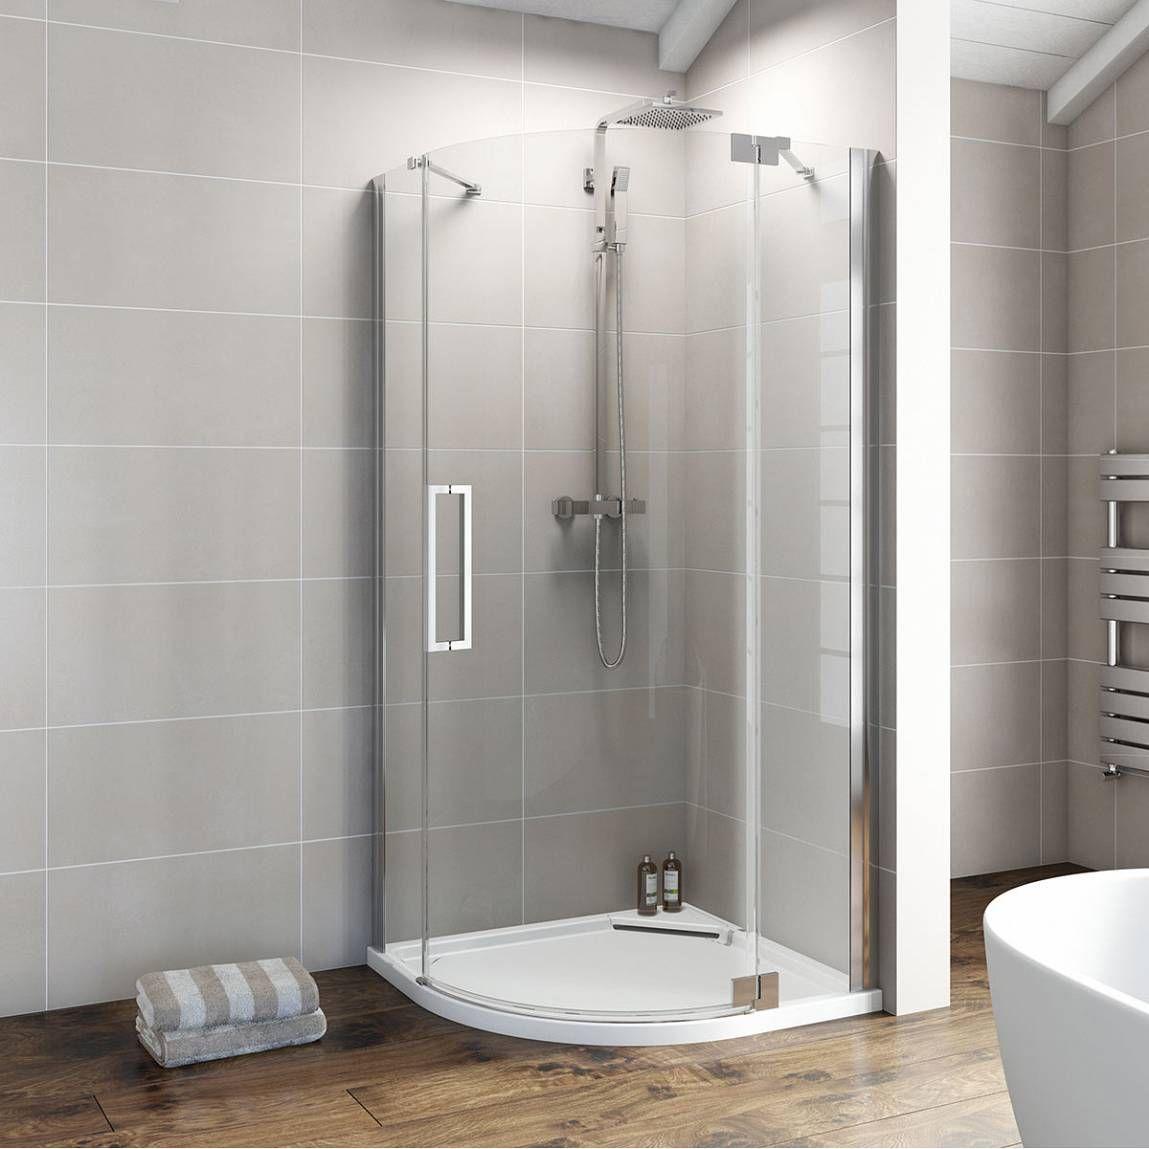 Victoria Plumb Showers >> V8 Frameless Quadrant Hinged Enclosure 800 Rh Victoria Plumb